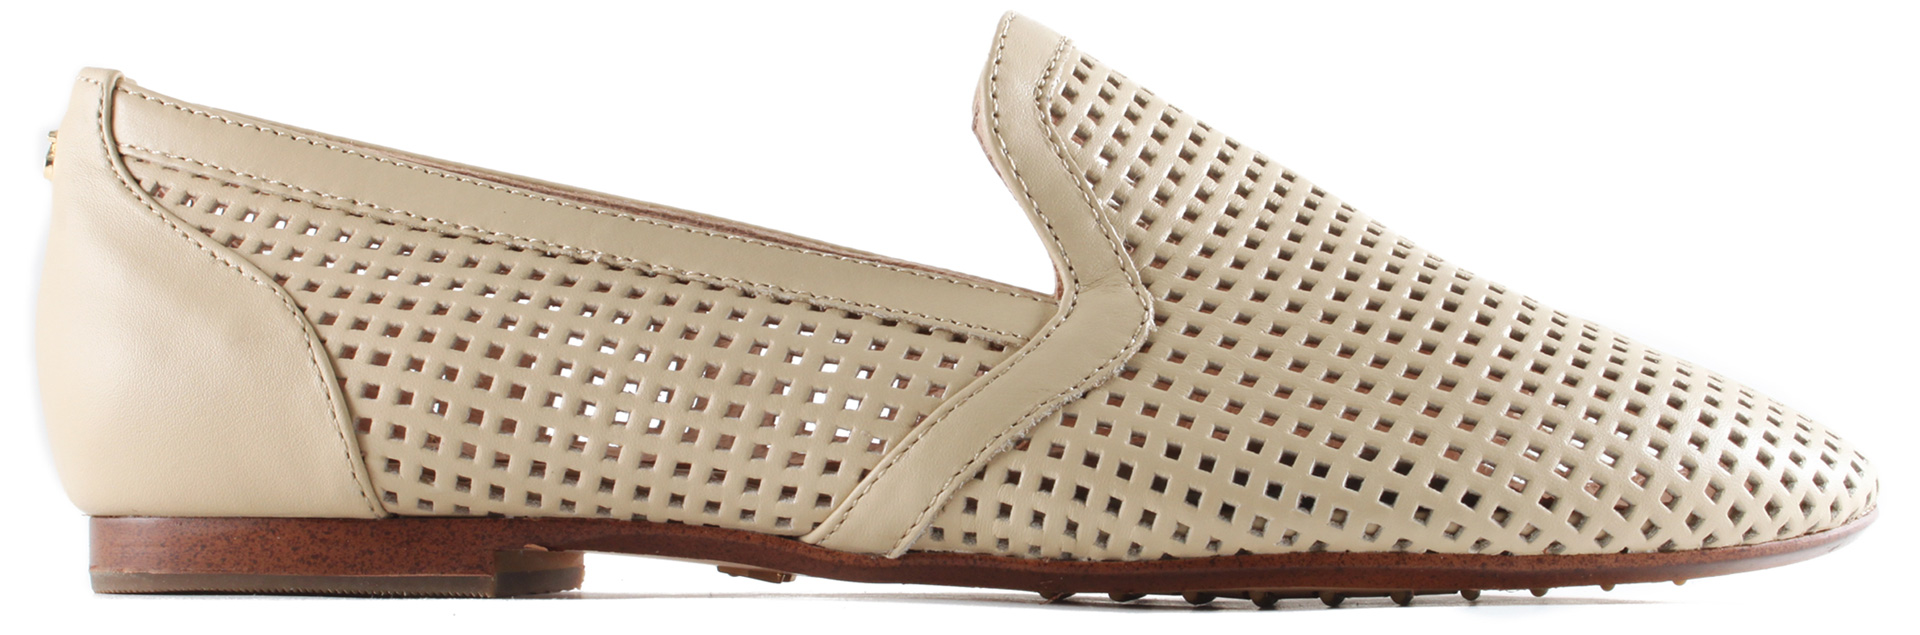 Shop the look: Yosi Samra Perforated Loafer in Biscotti (yosisamra.com, $150)